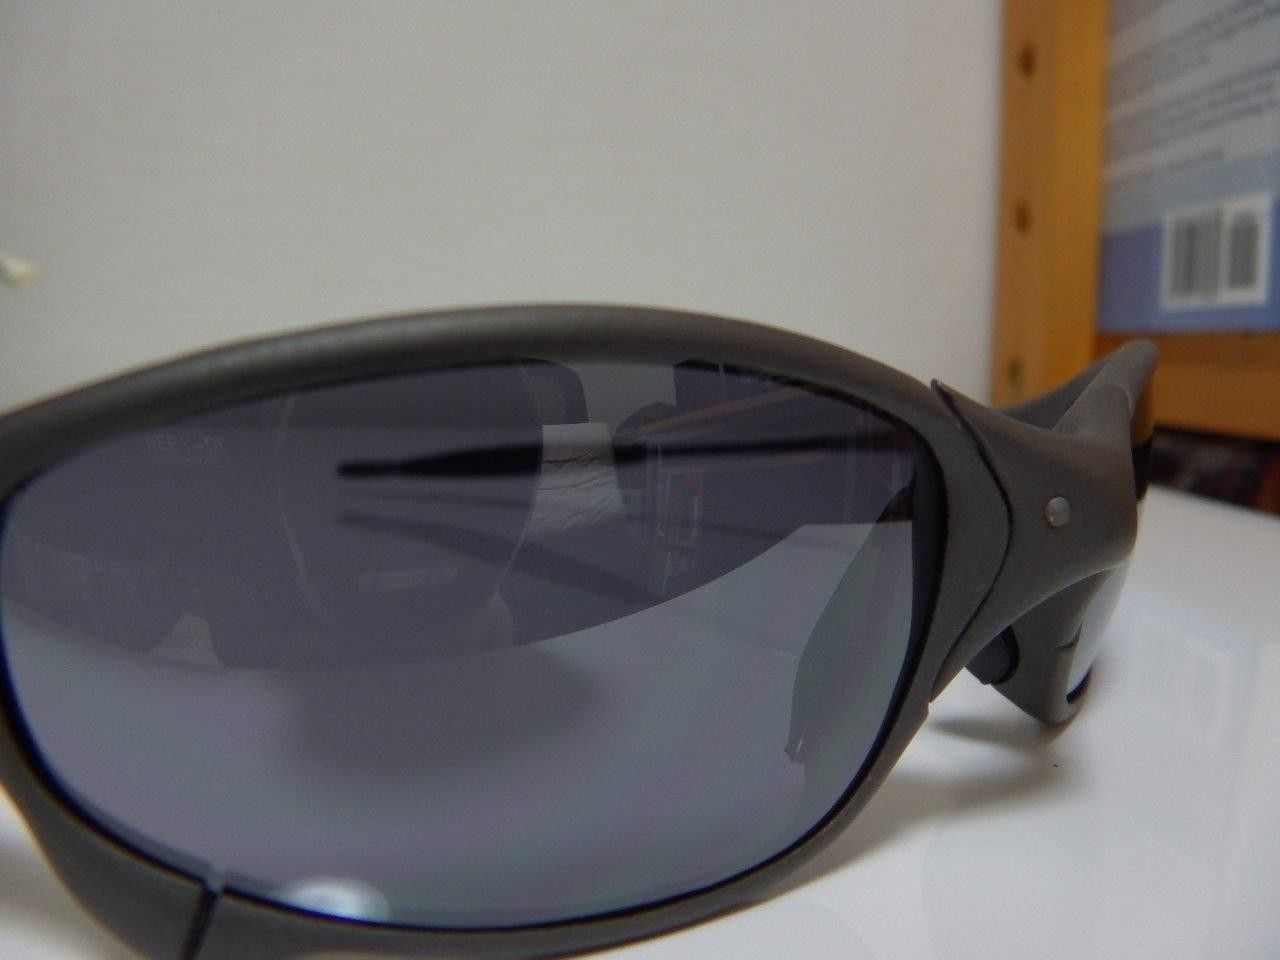 ae0c18206b715 Oakley Juliet Lenses Original « Heritage Malta